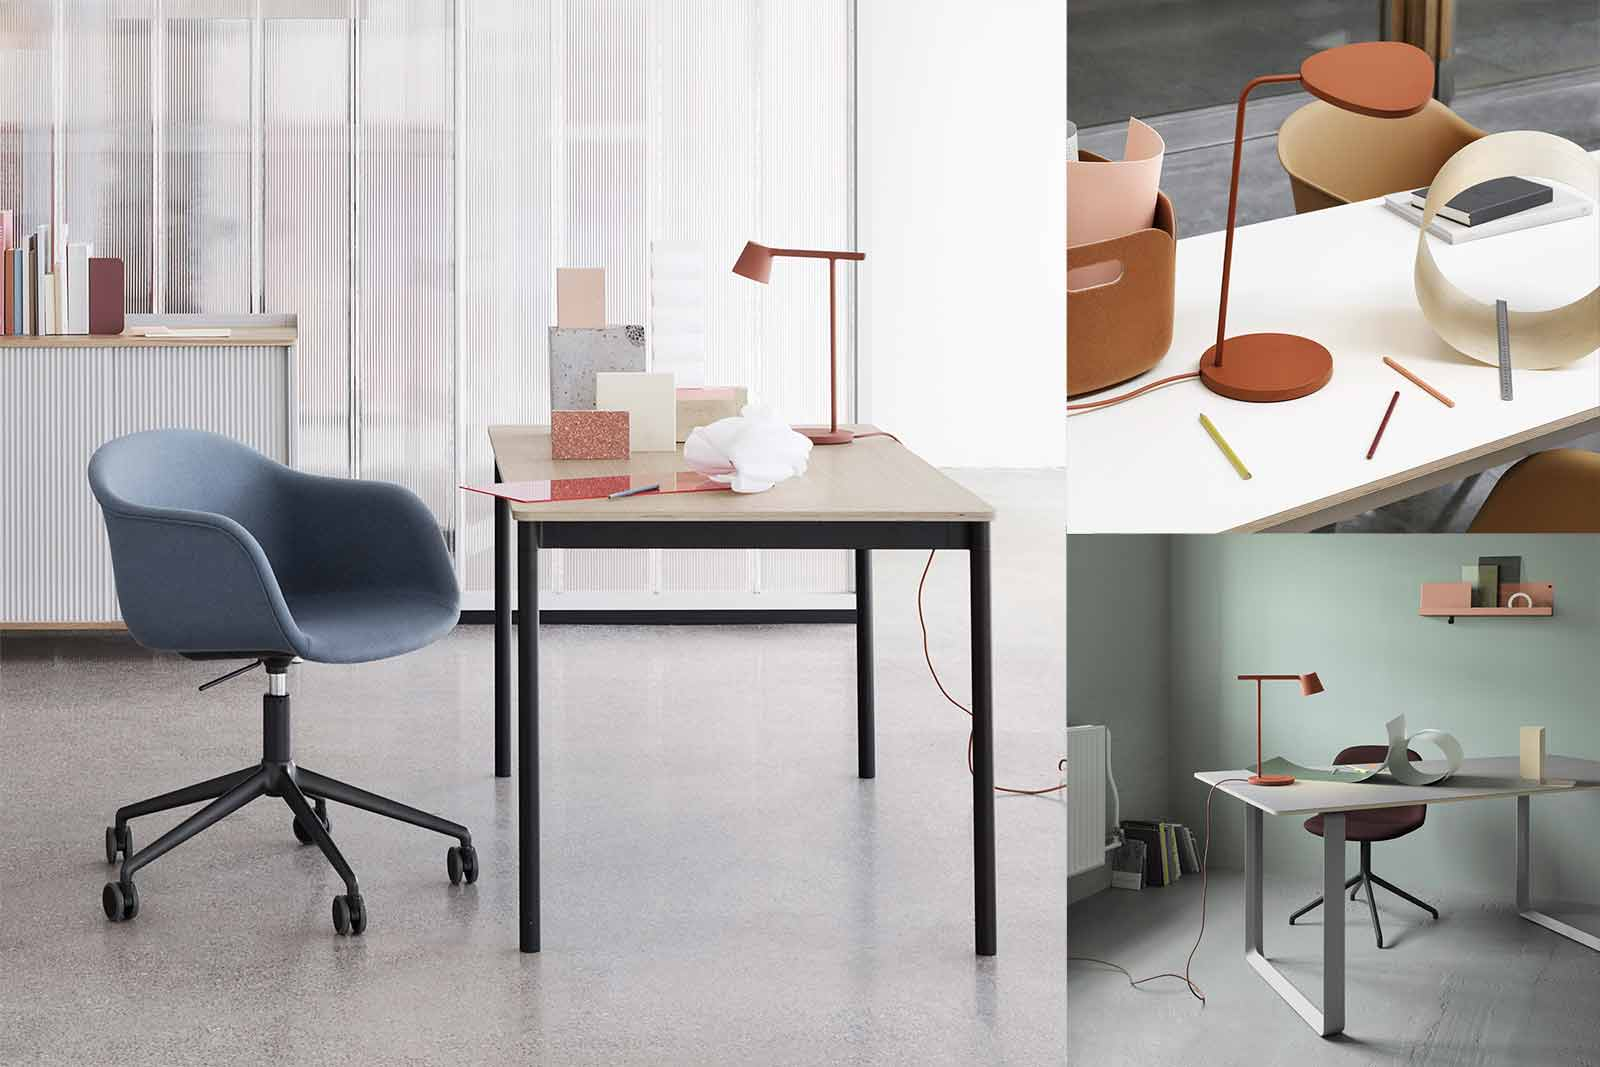 Muuto Home Office Inspirationen, Boutique Danoise Basel Daenische Designer Moebel Accessoires Wohnen News